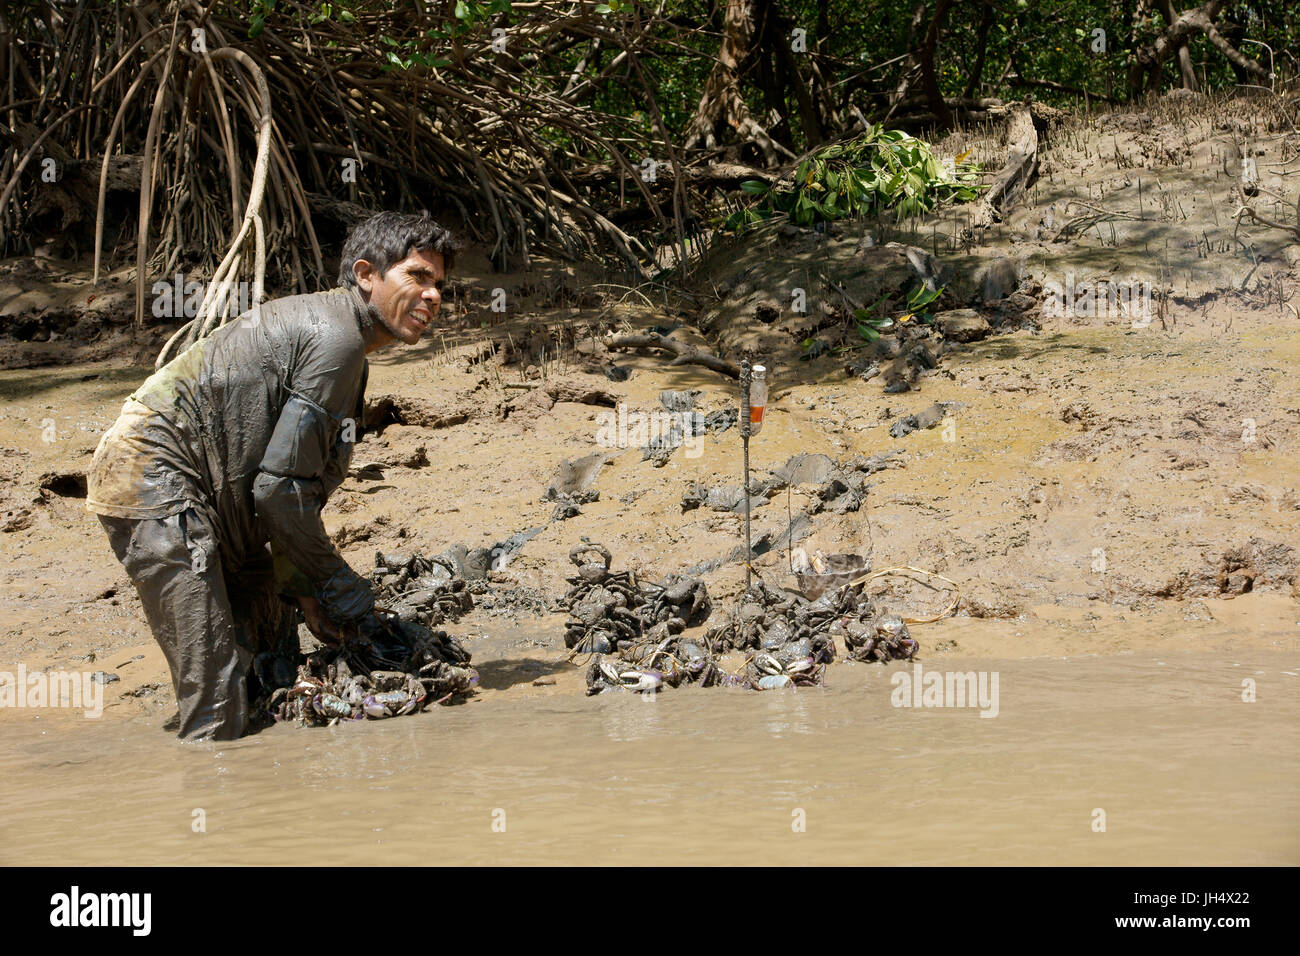 People, man, swamp, City, Parnaíba, Piauí, Brazil - Stock Image